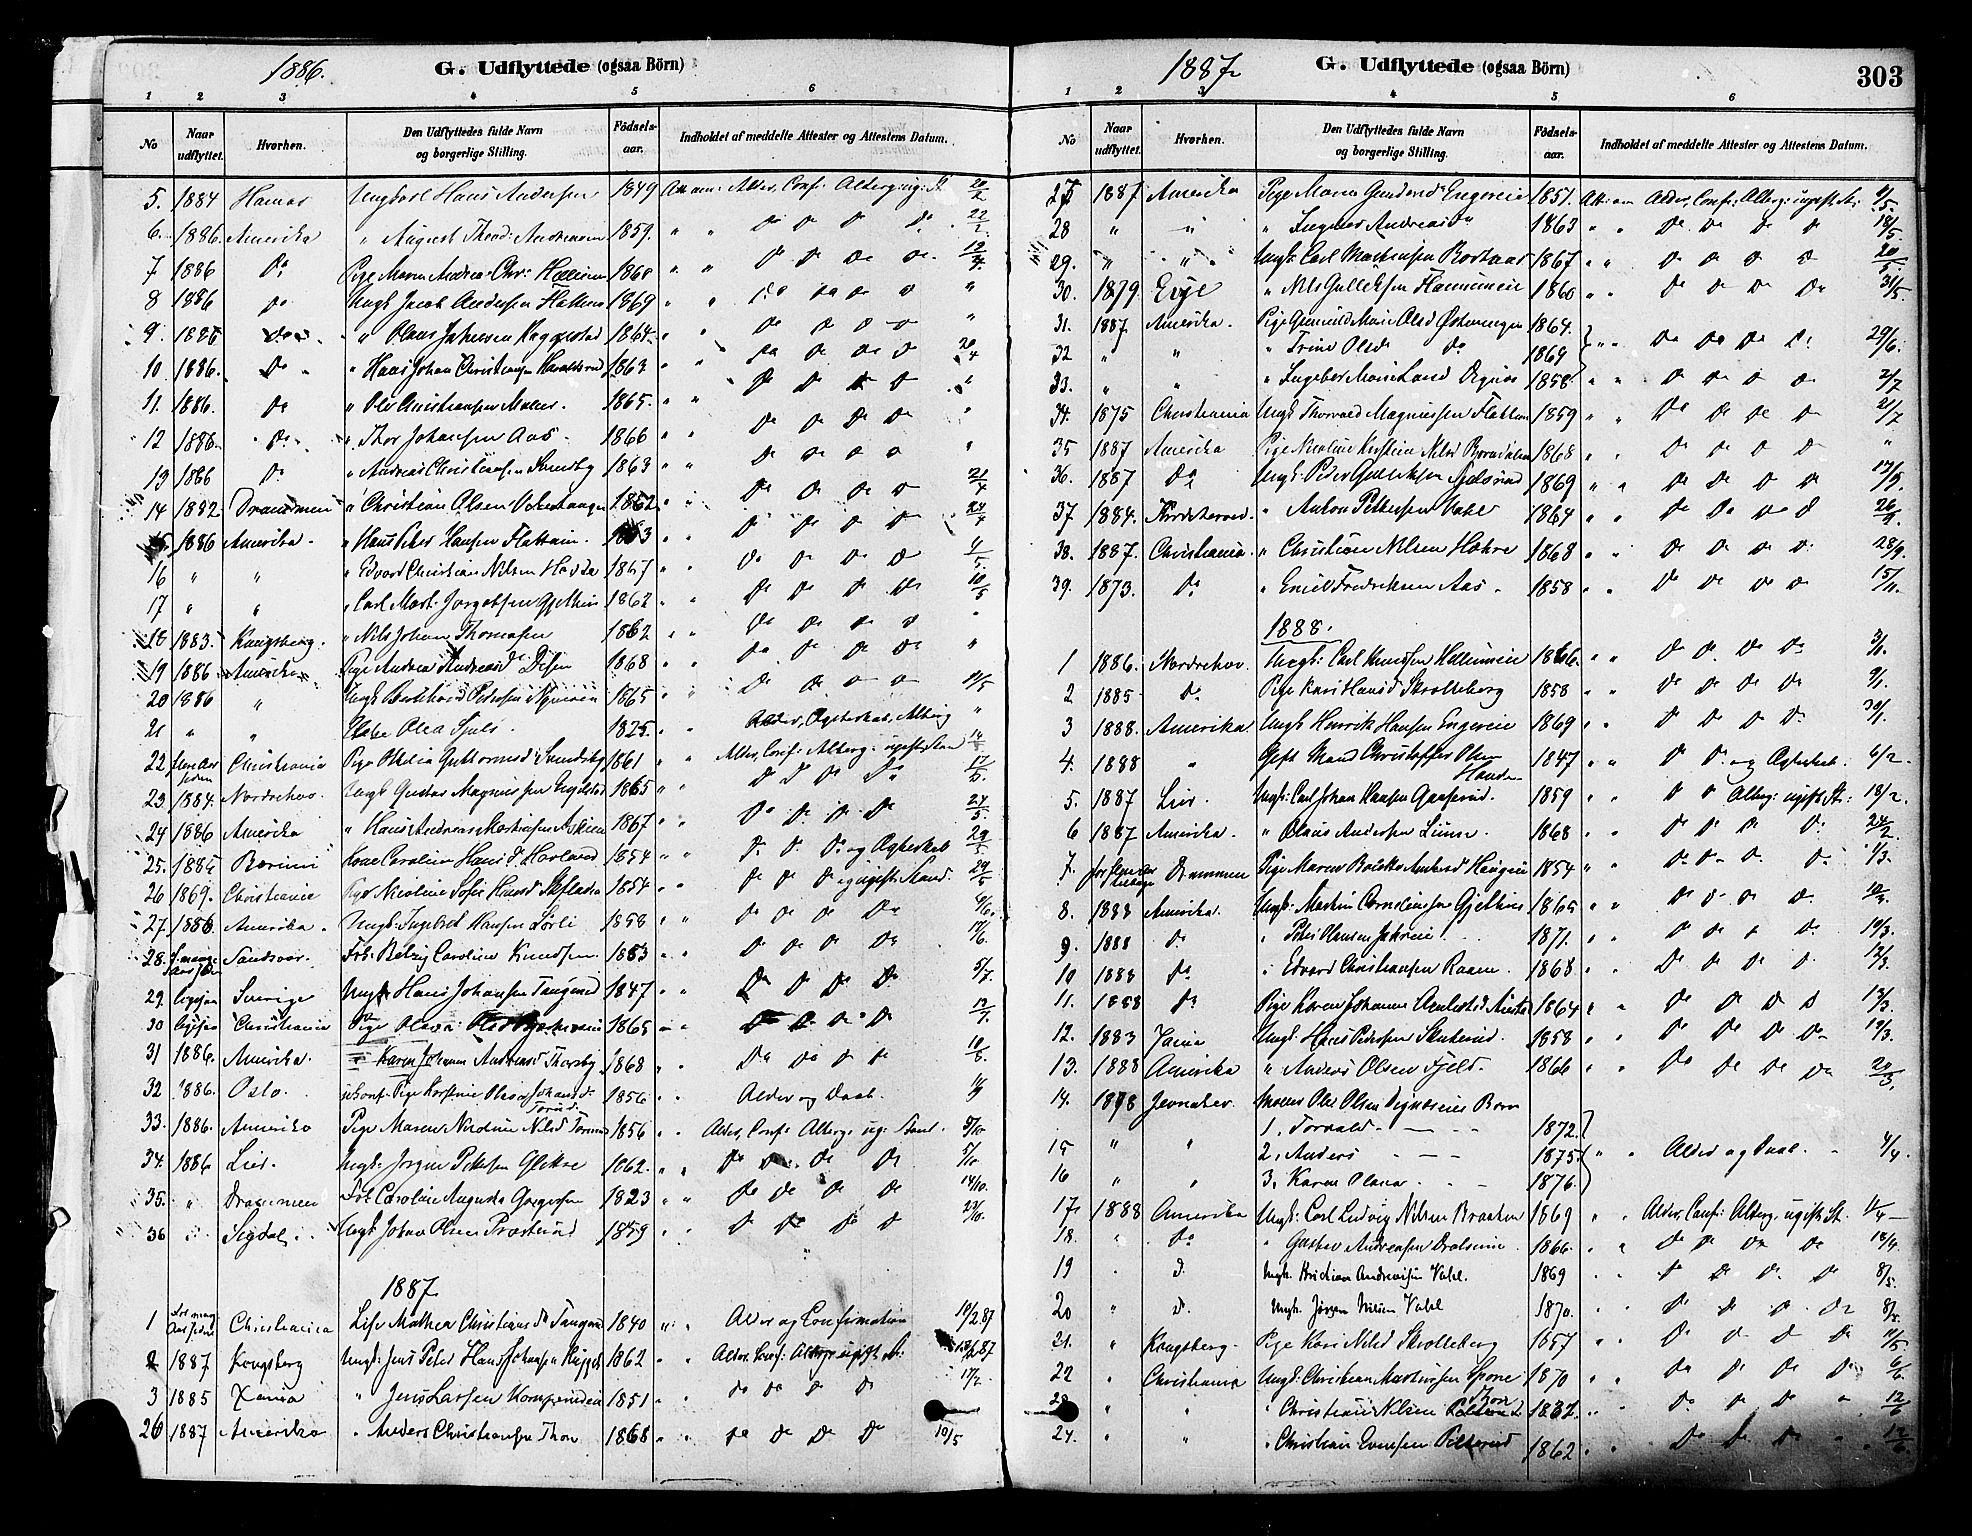 SAKO, Modum kirkebøker, F/Fa/L0011: Ministerialbok nr. 11, 1877-1889, s. 303